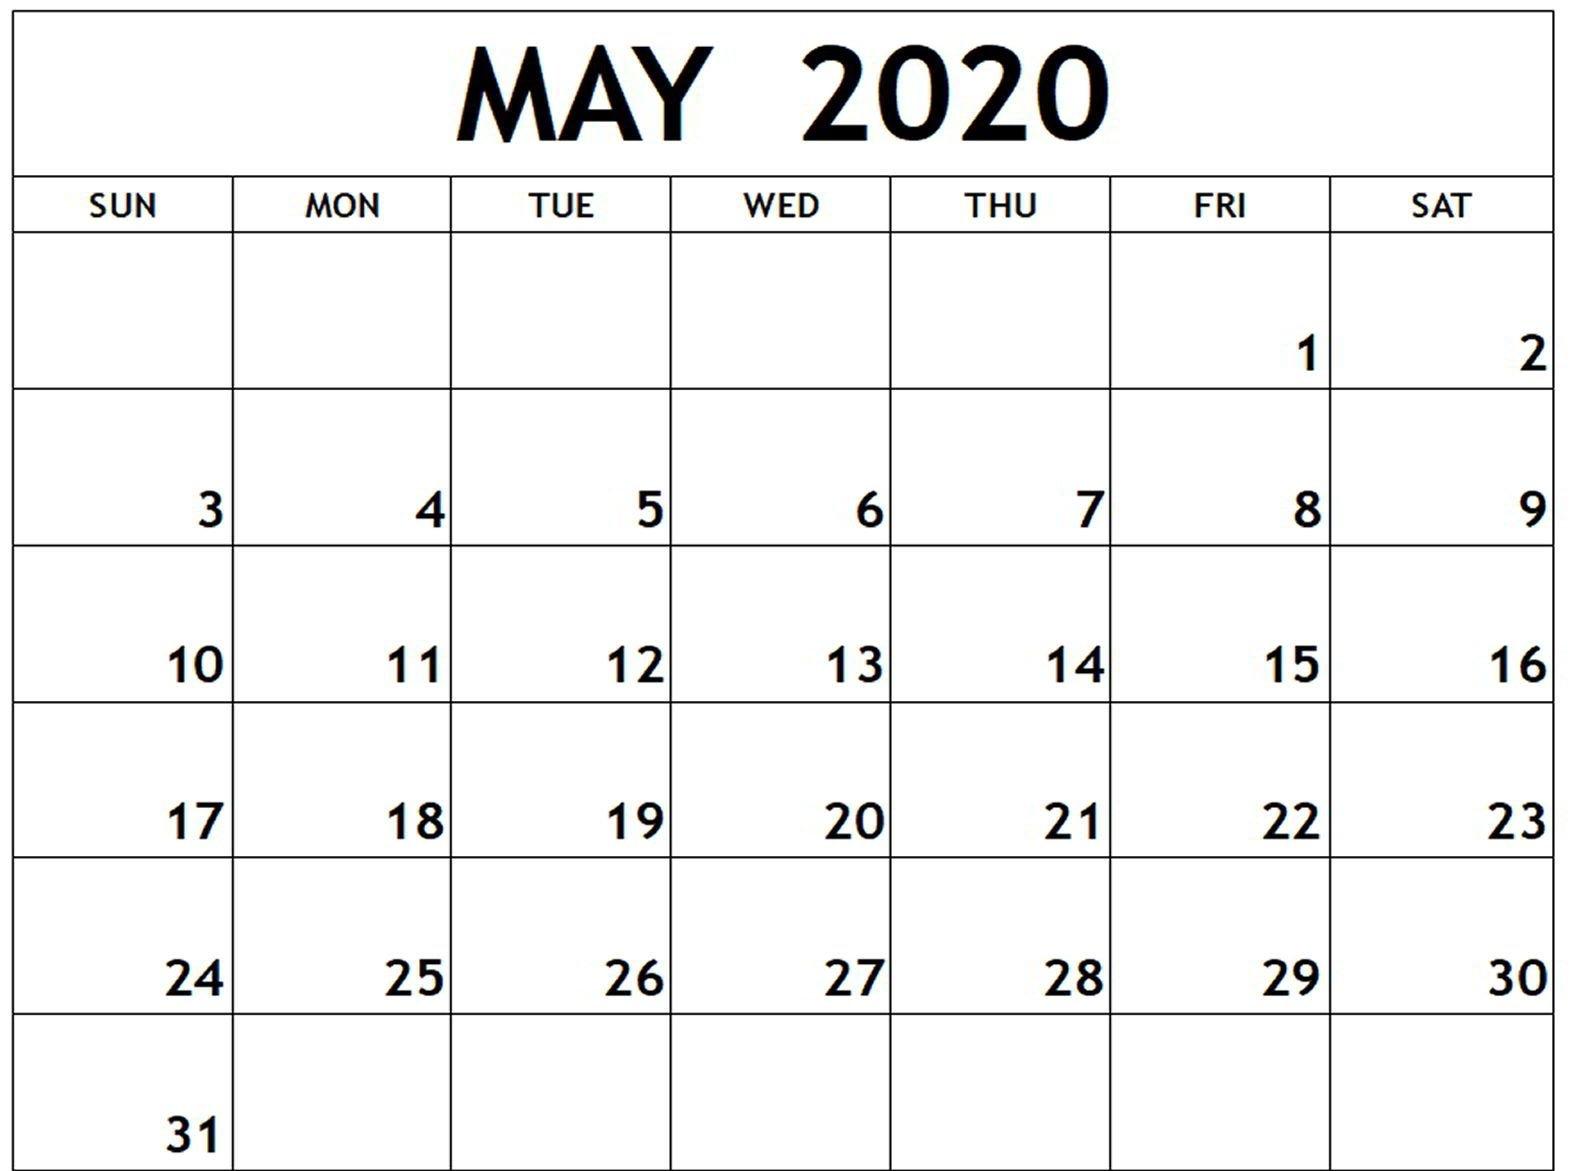 Fillable May 2020 Calendar Editable Printable Notes To Do Fillable Calendar For Excercise